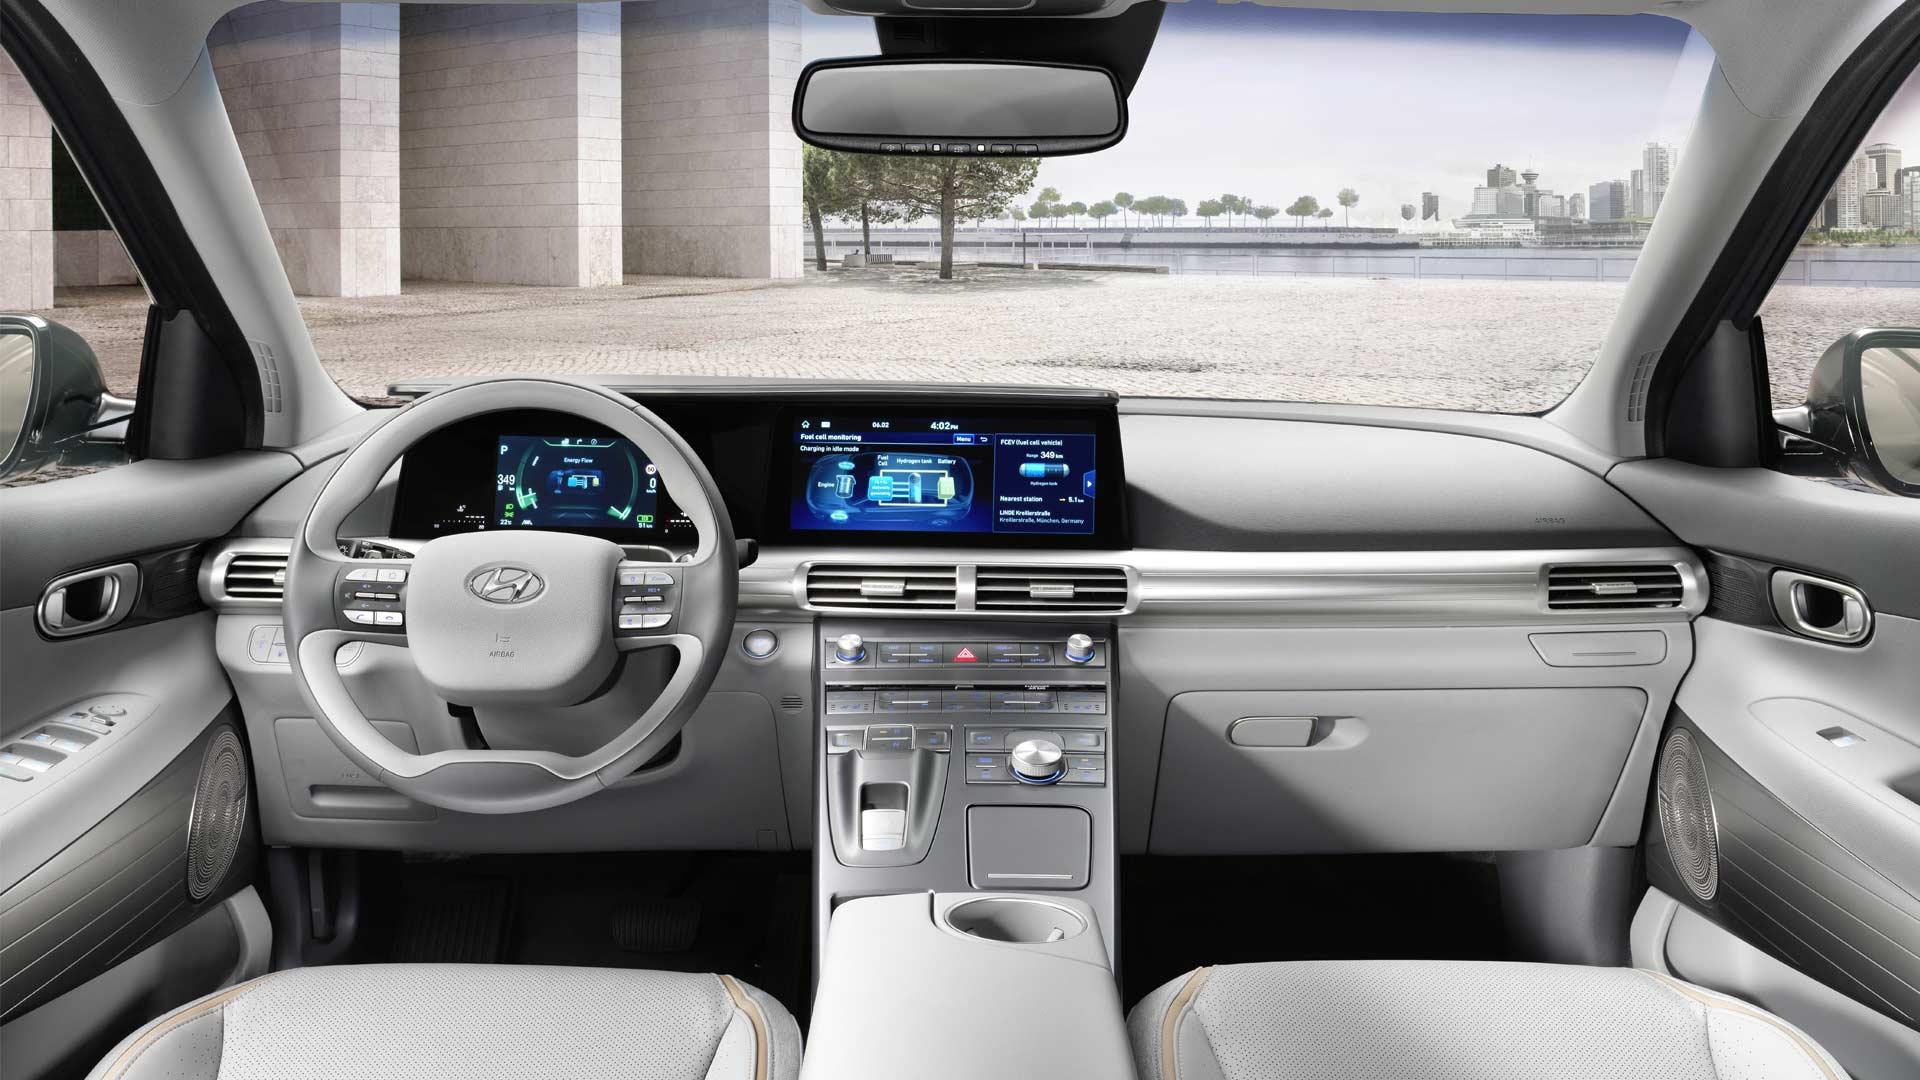 2019-Hyundai-Nexo-fuel-cell-SUV-Interiors